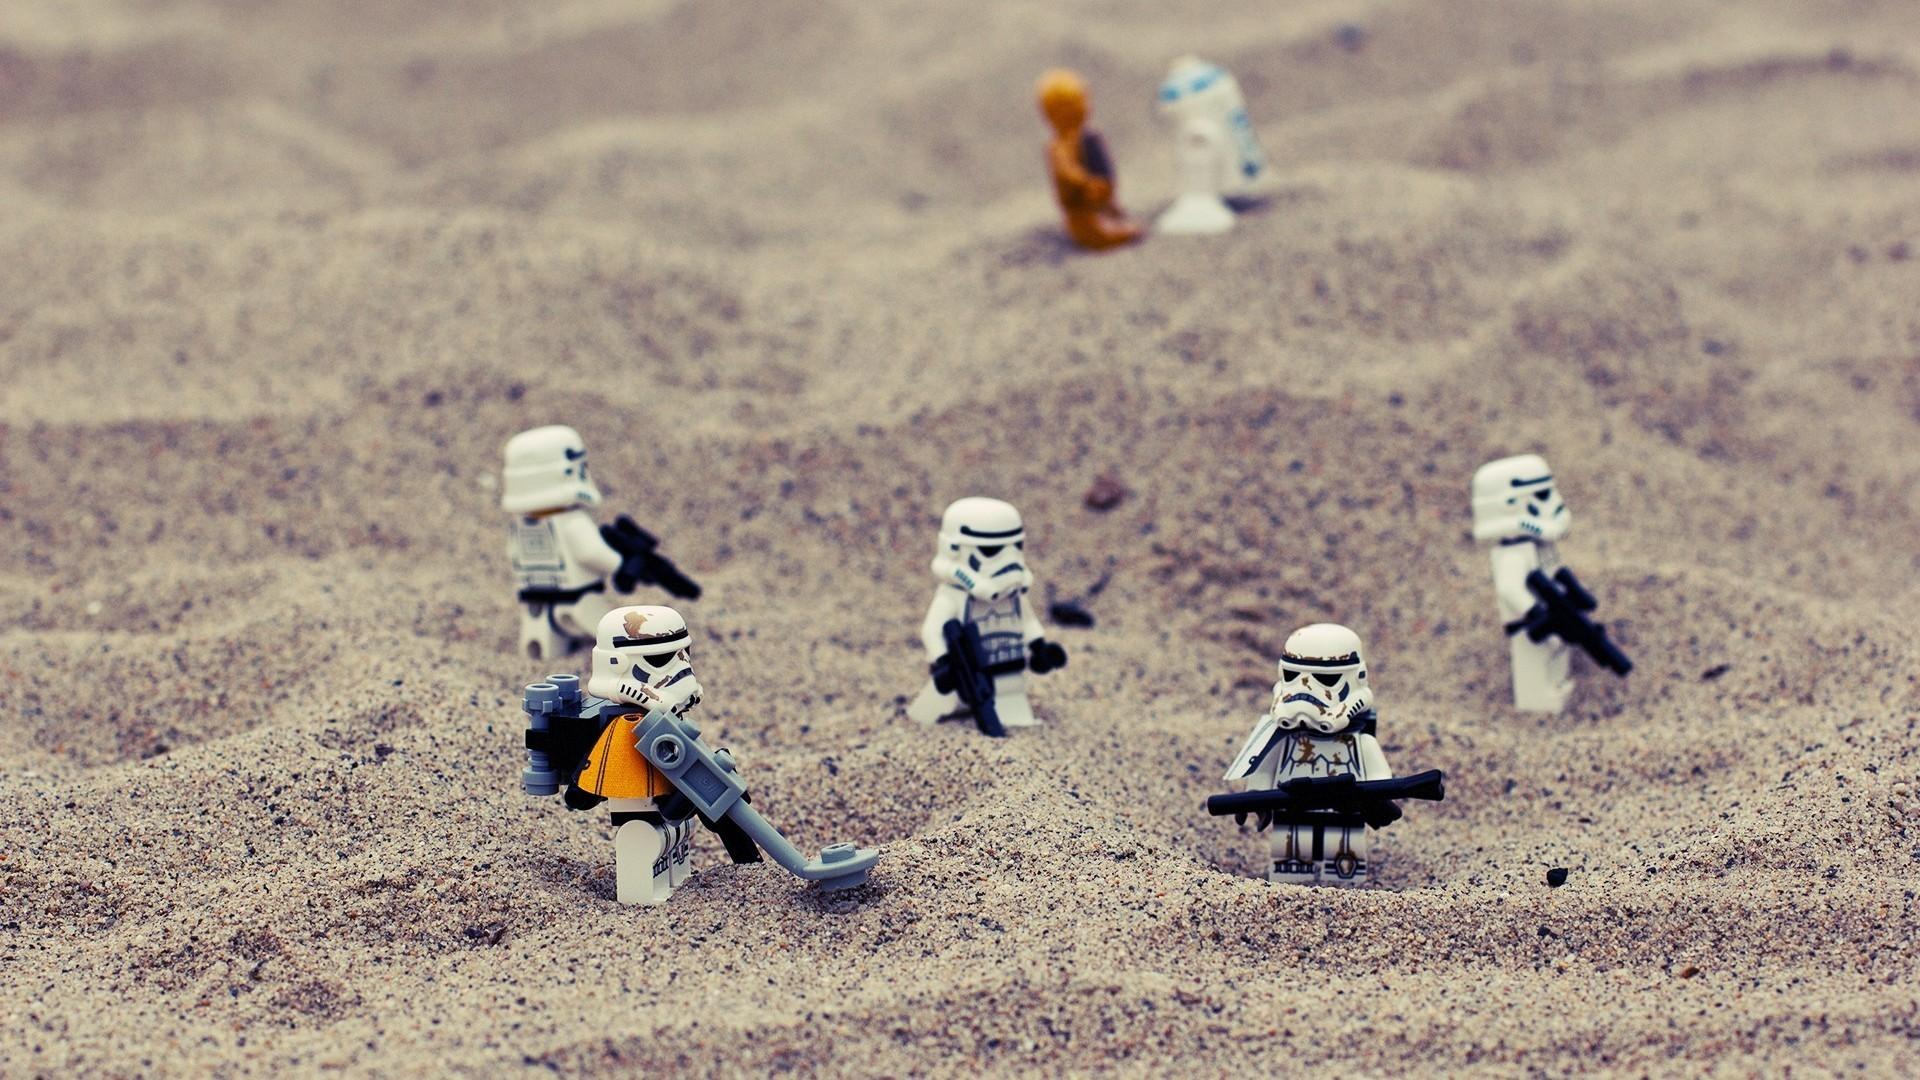 Lego Star Wars Wallpaper Hd Wallpapers Hd Car Pictures Hd Lego Star Wars 1920x1080 Download Hd Wallpaper Wallpapertip